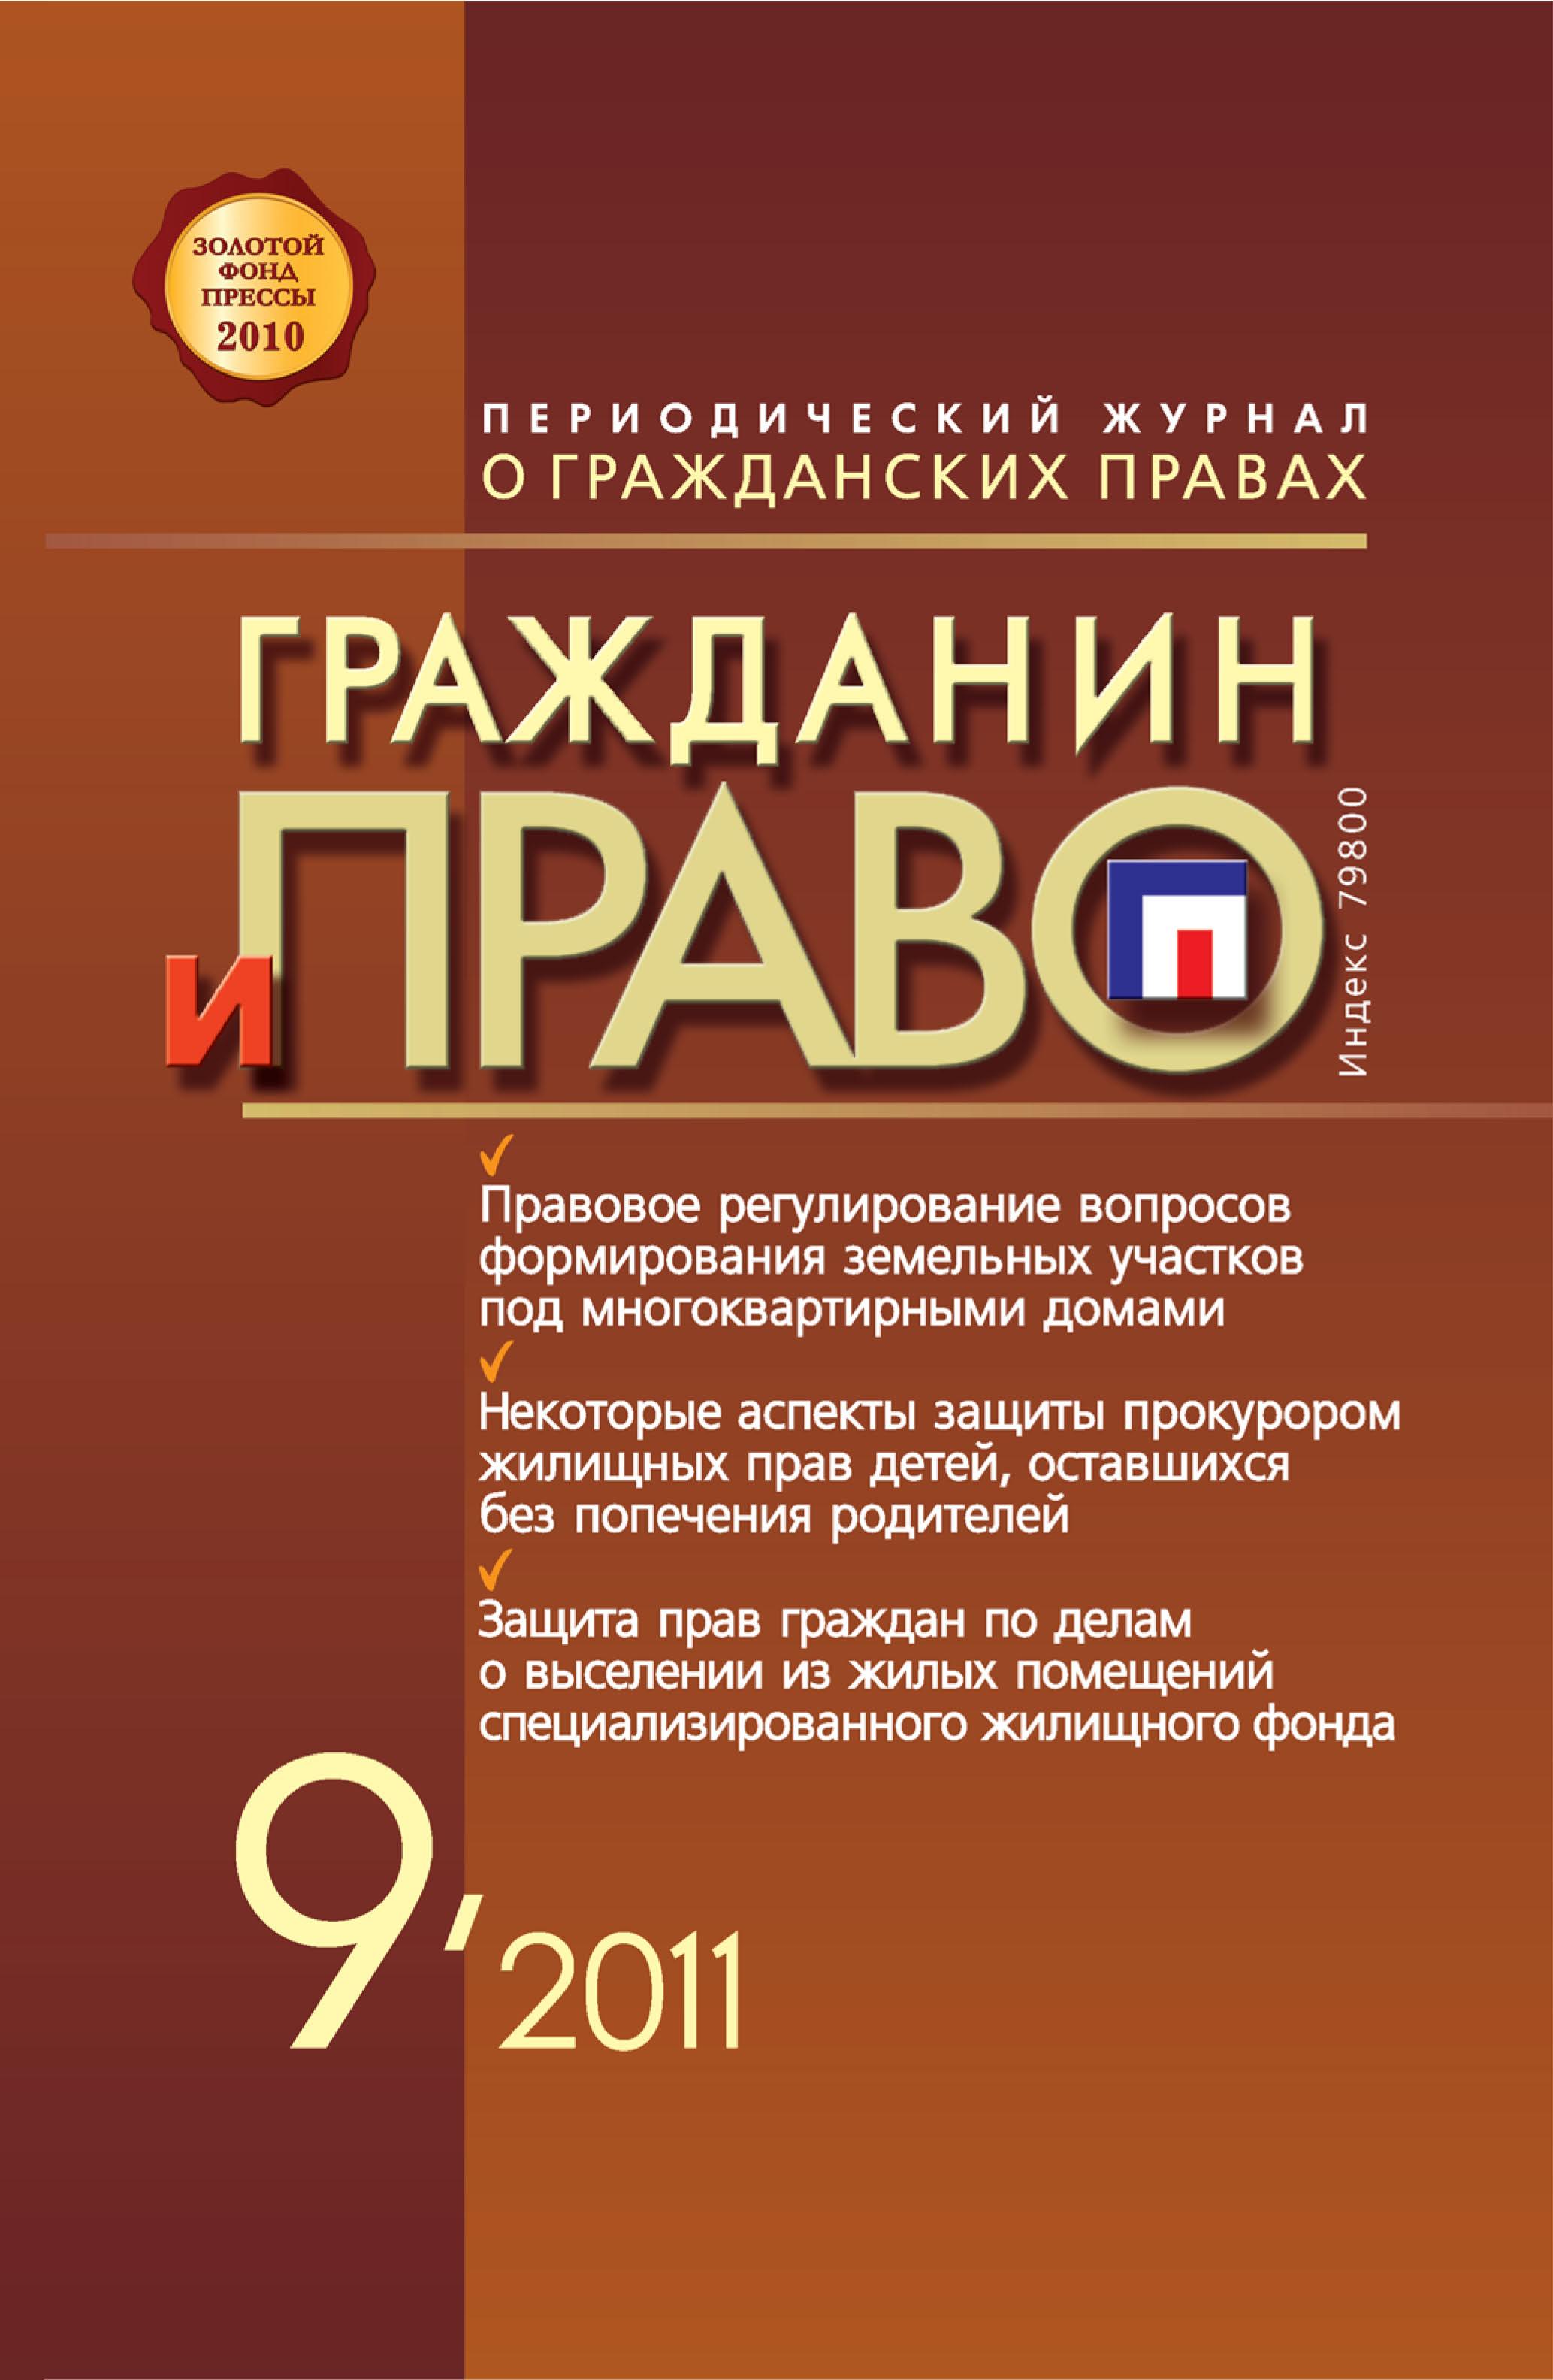 Гражданин и право №09/2011